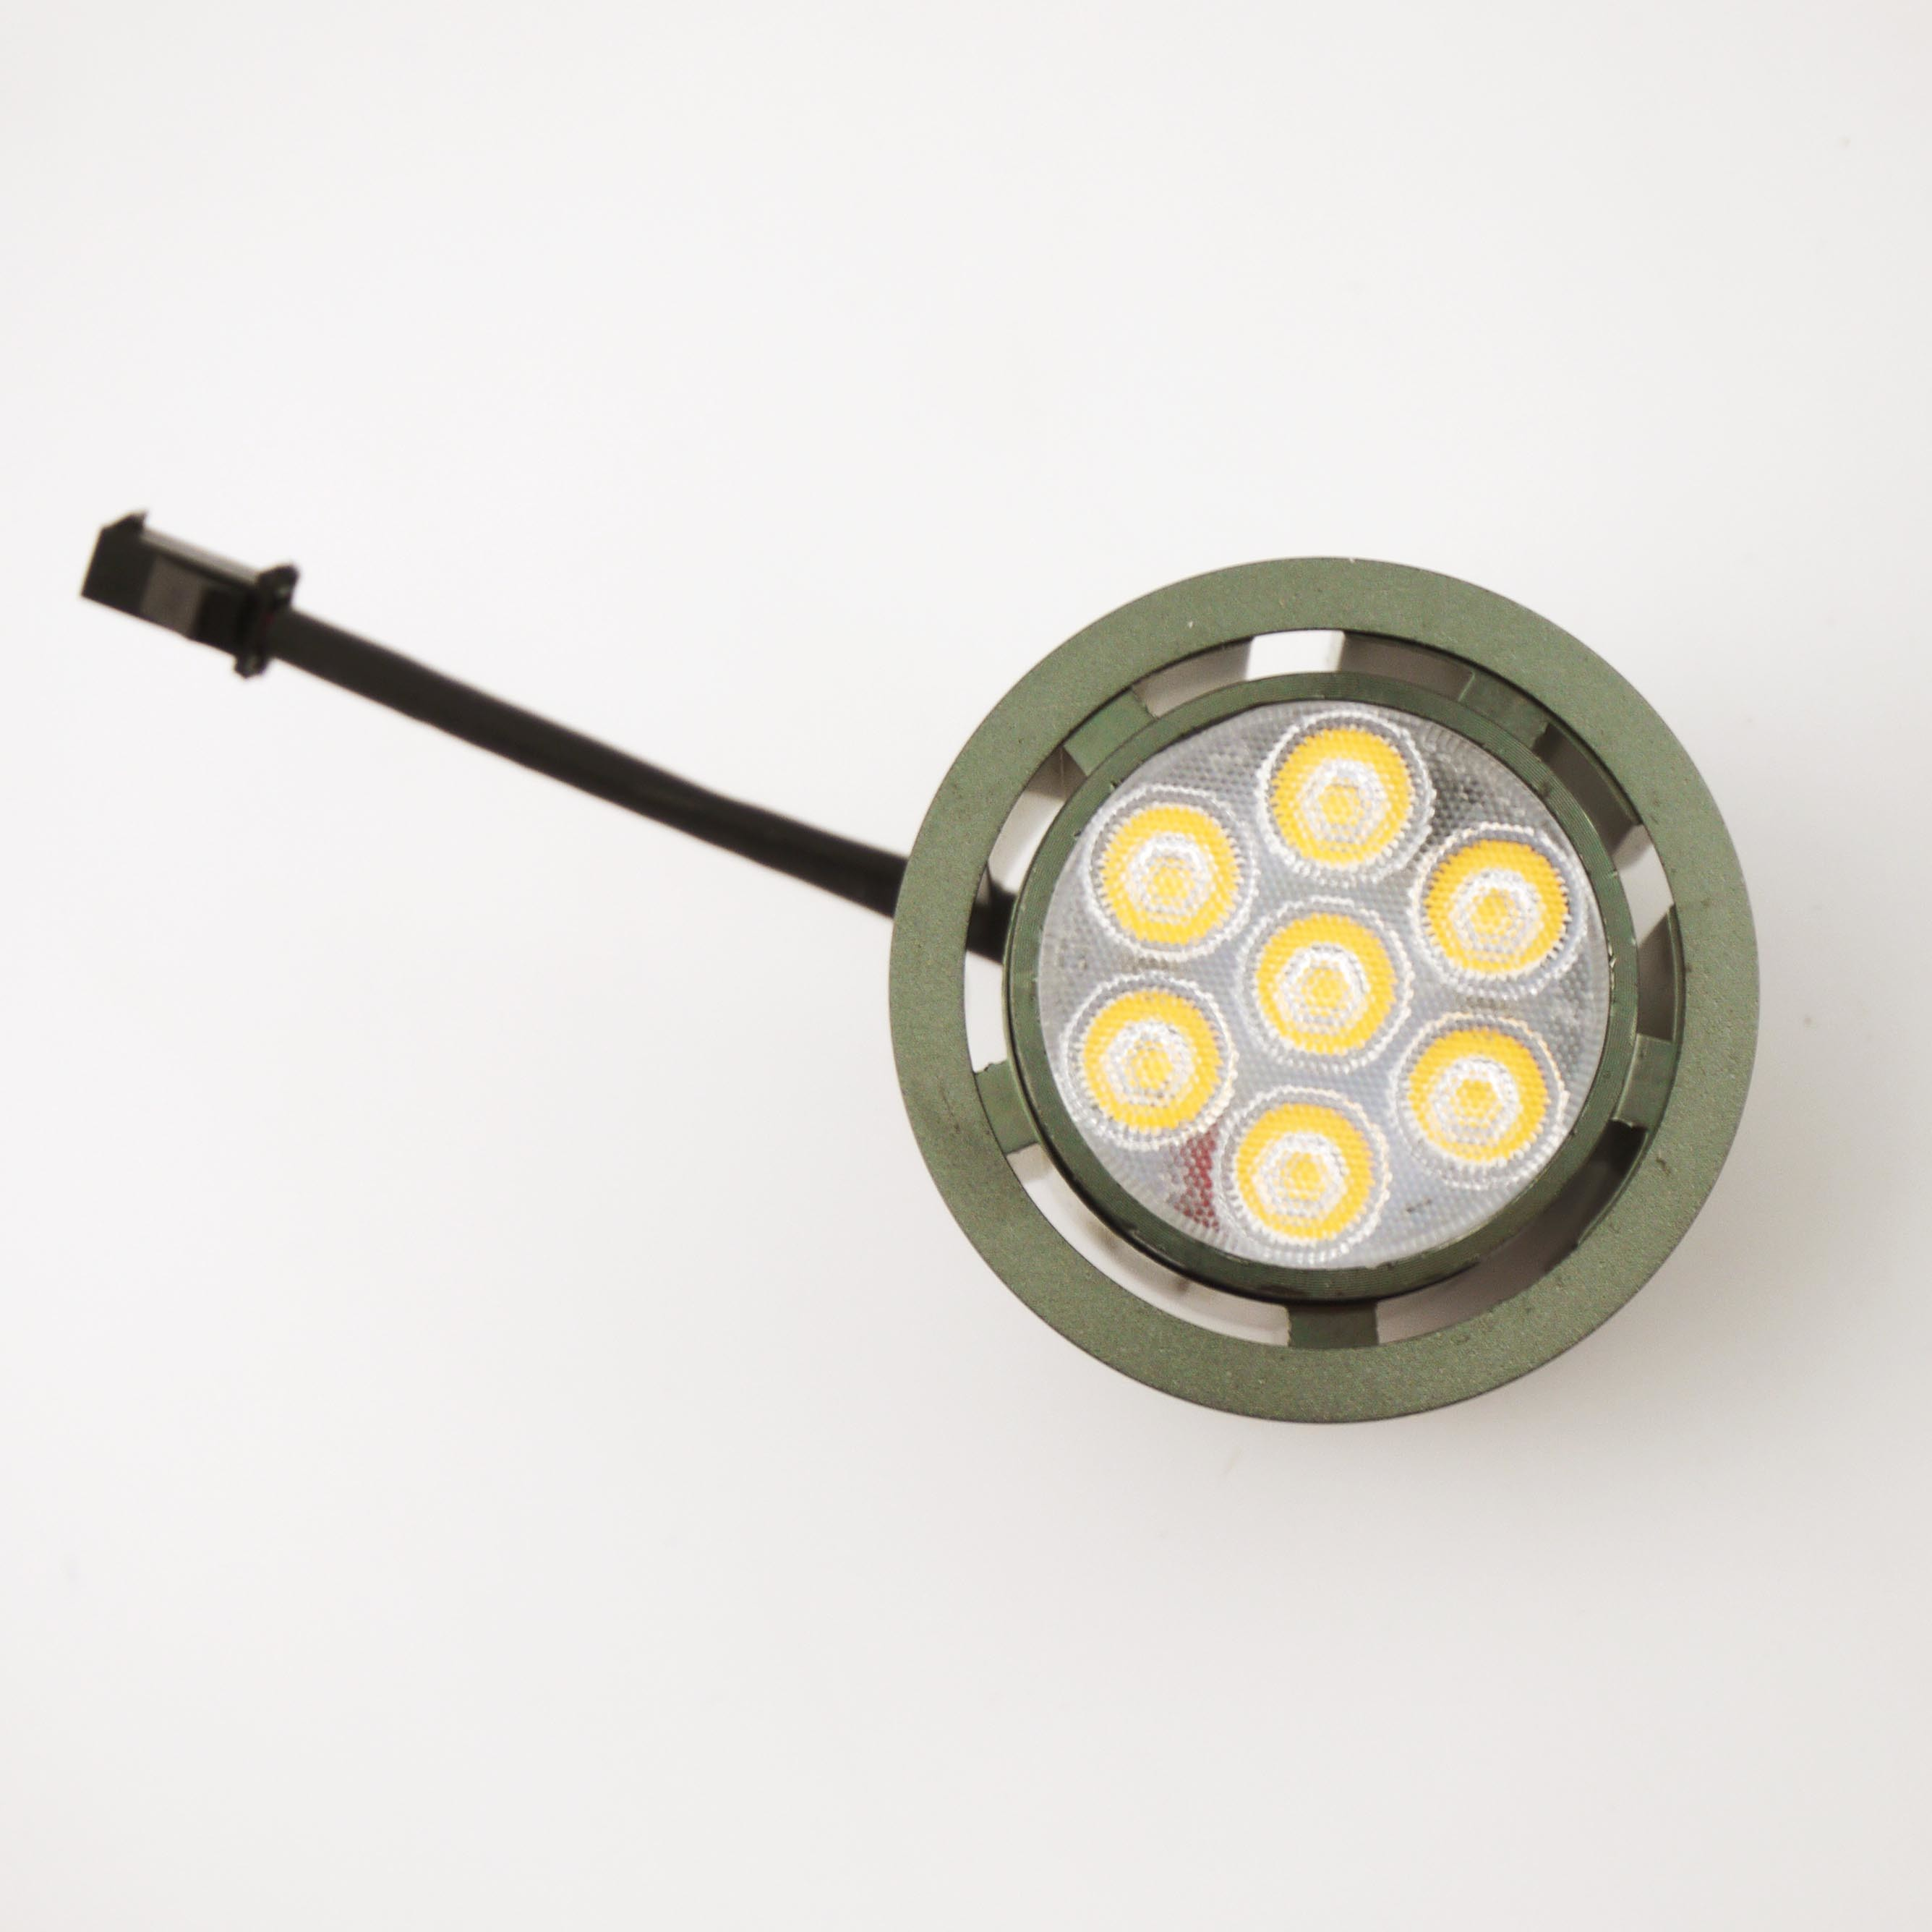 Pure Aluminum 7W SMD External Power Supply Downlight LED Bulb (LT8000-7W)